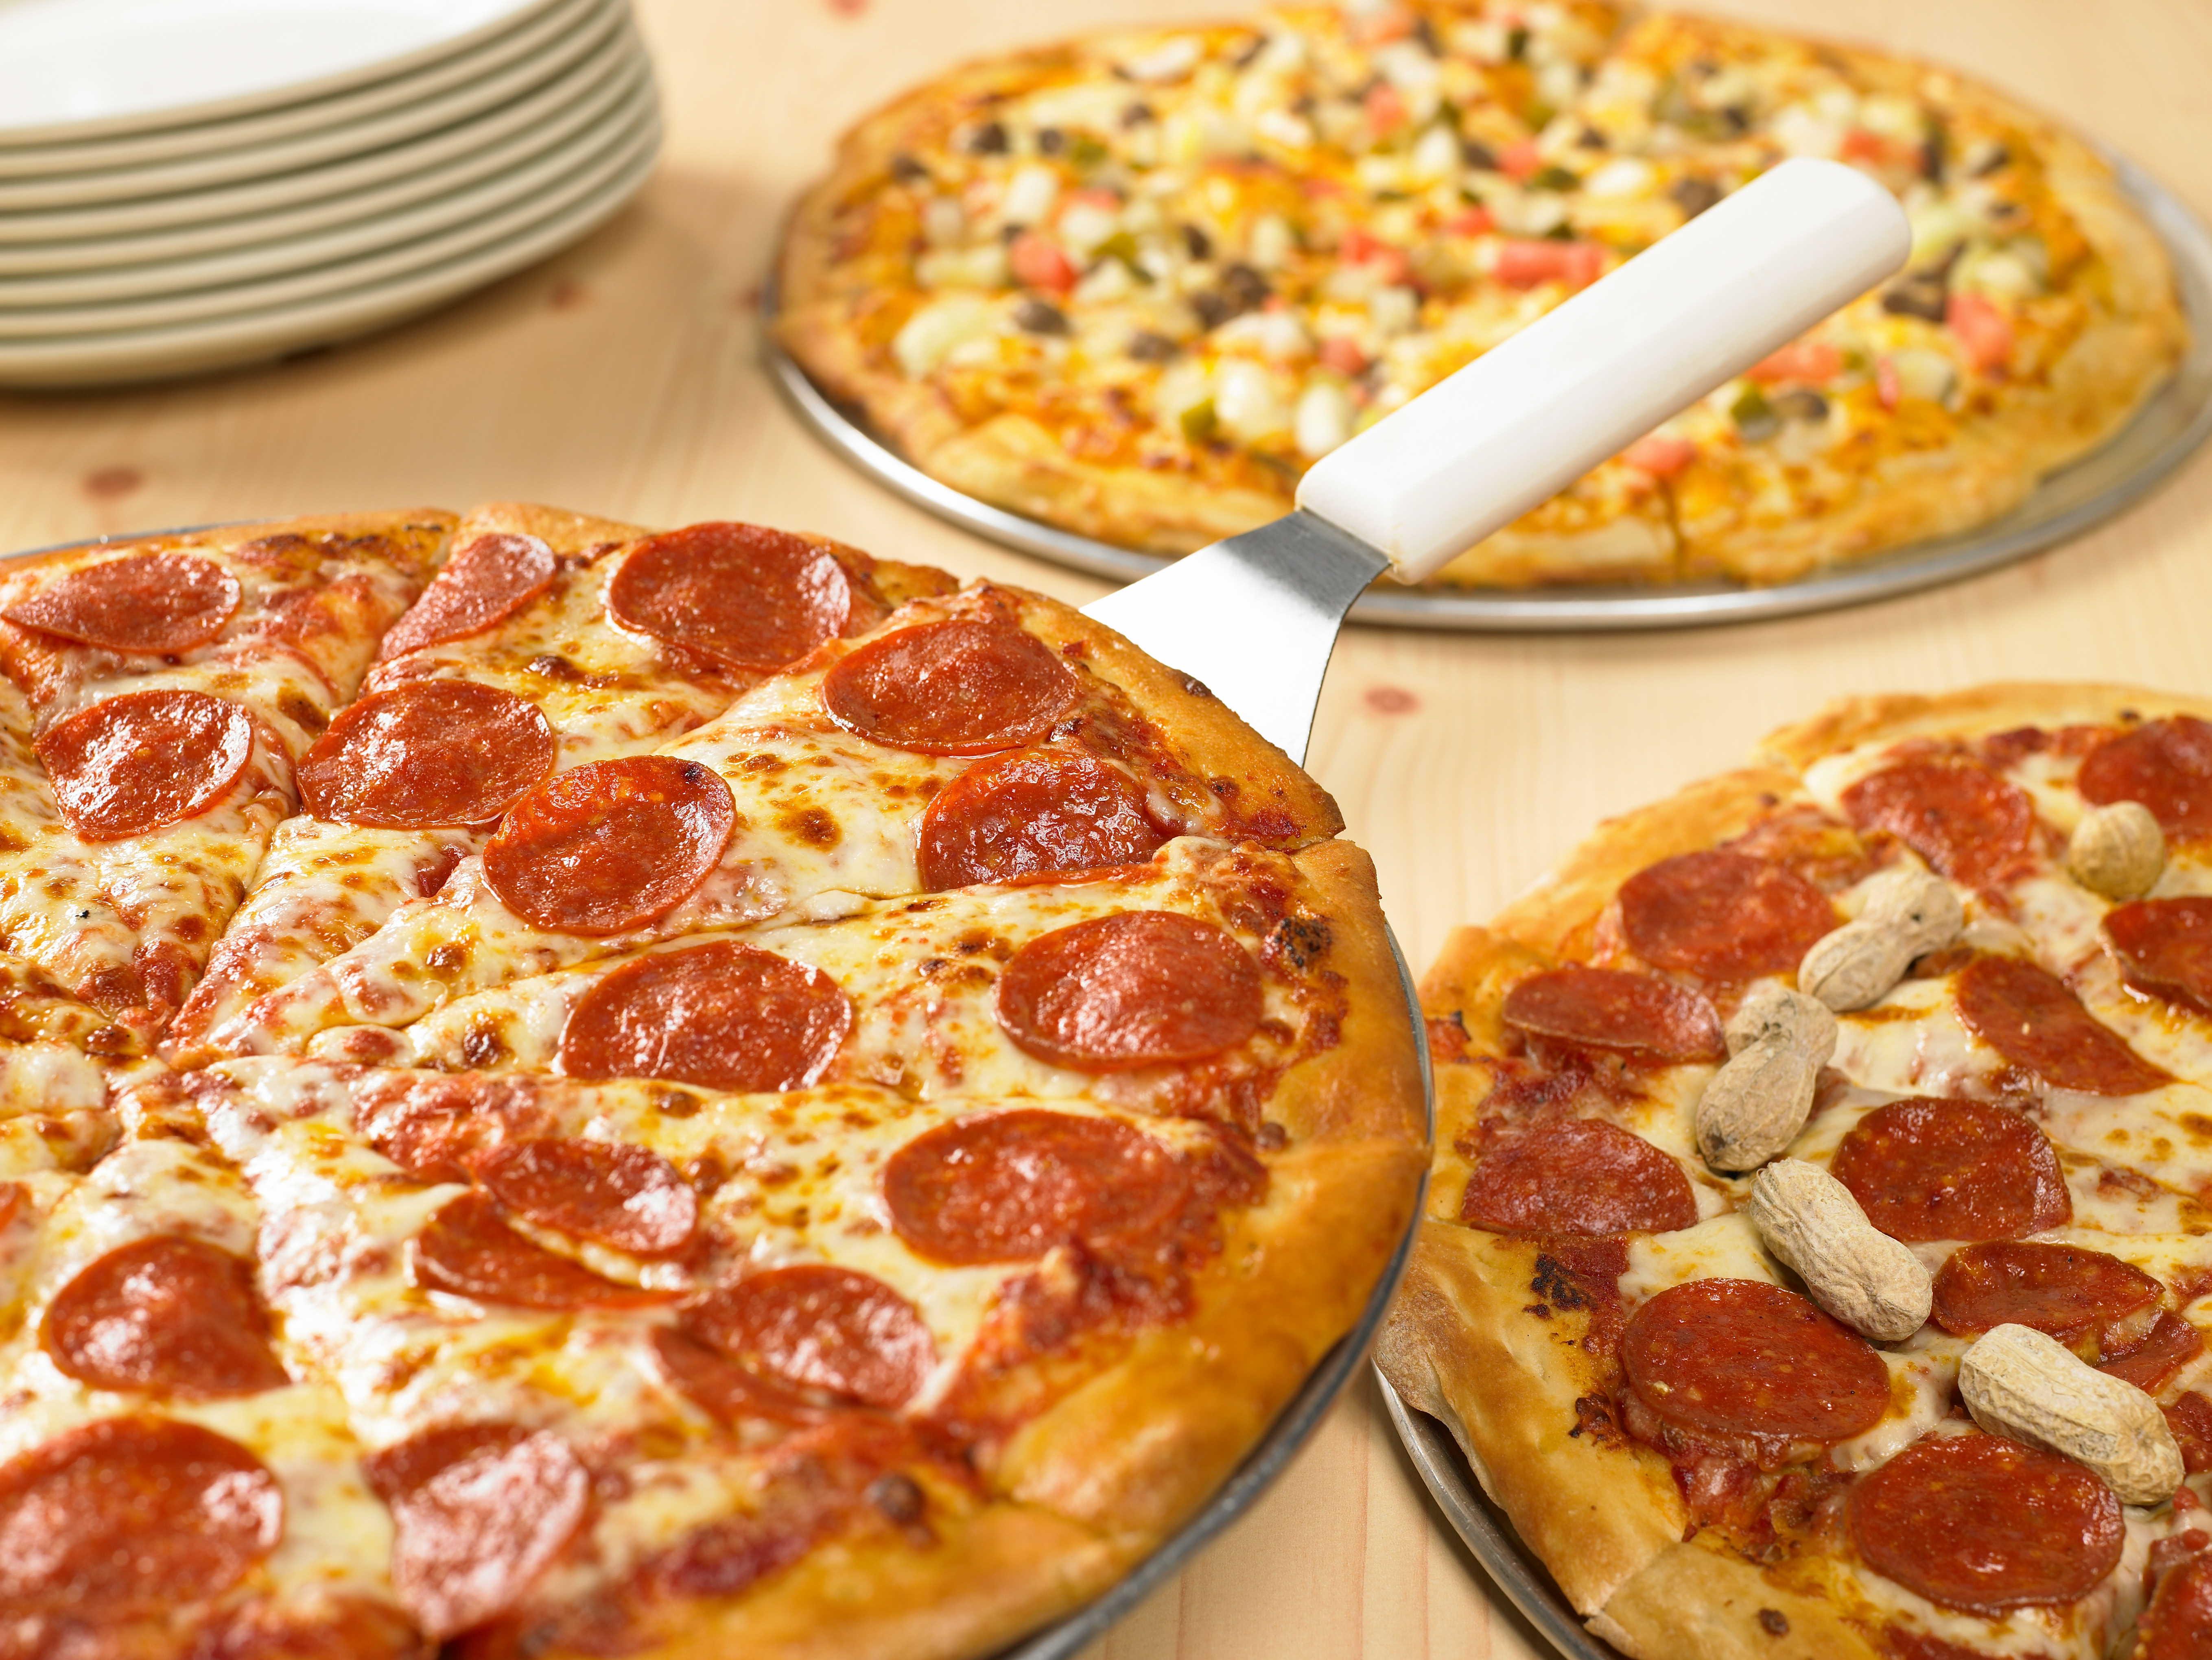 Pizzahs